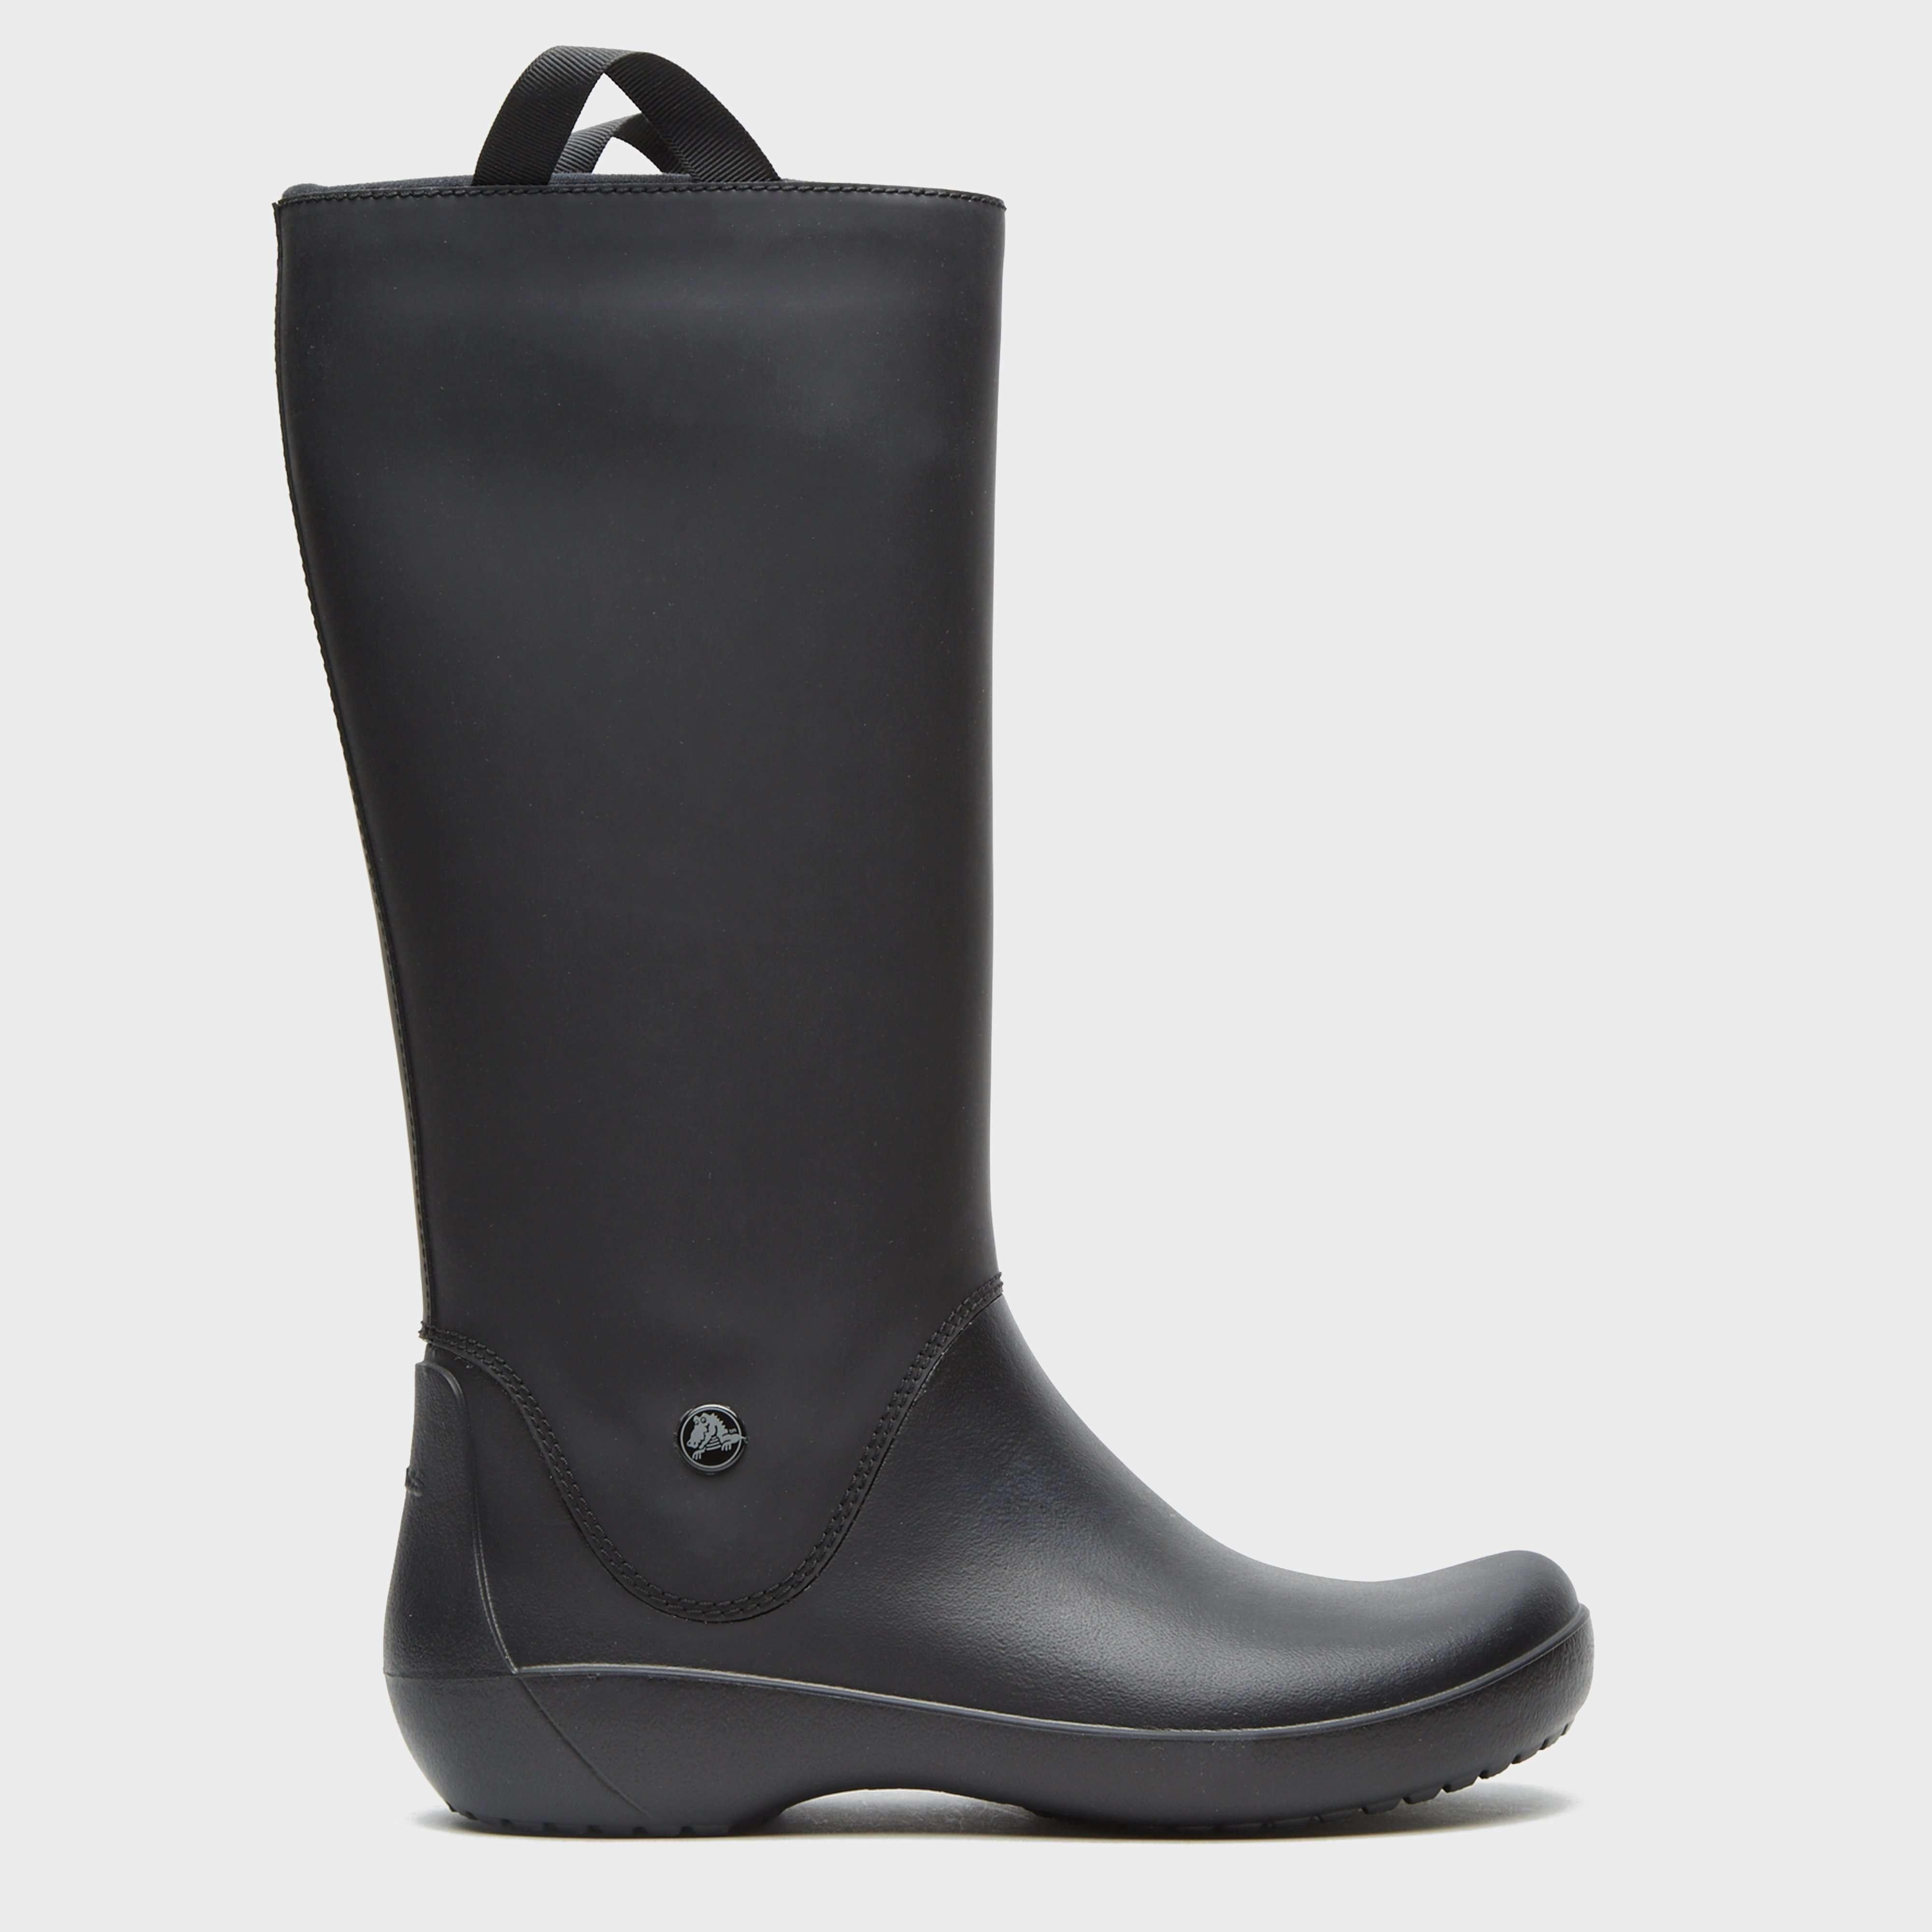 CROCS Women's RainFloe Wellington Boot